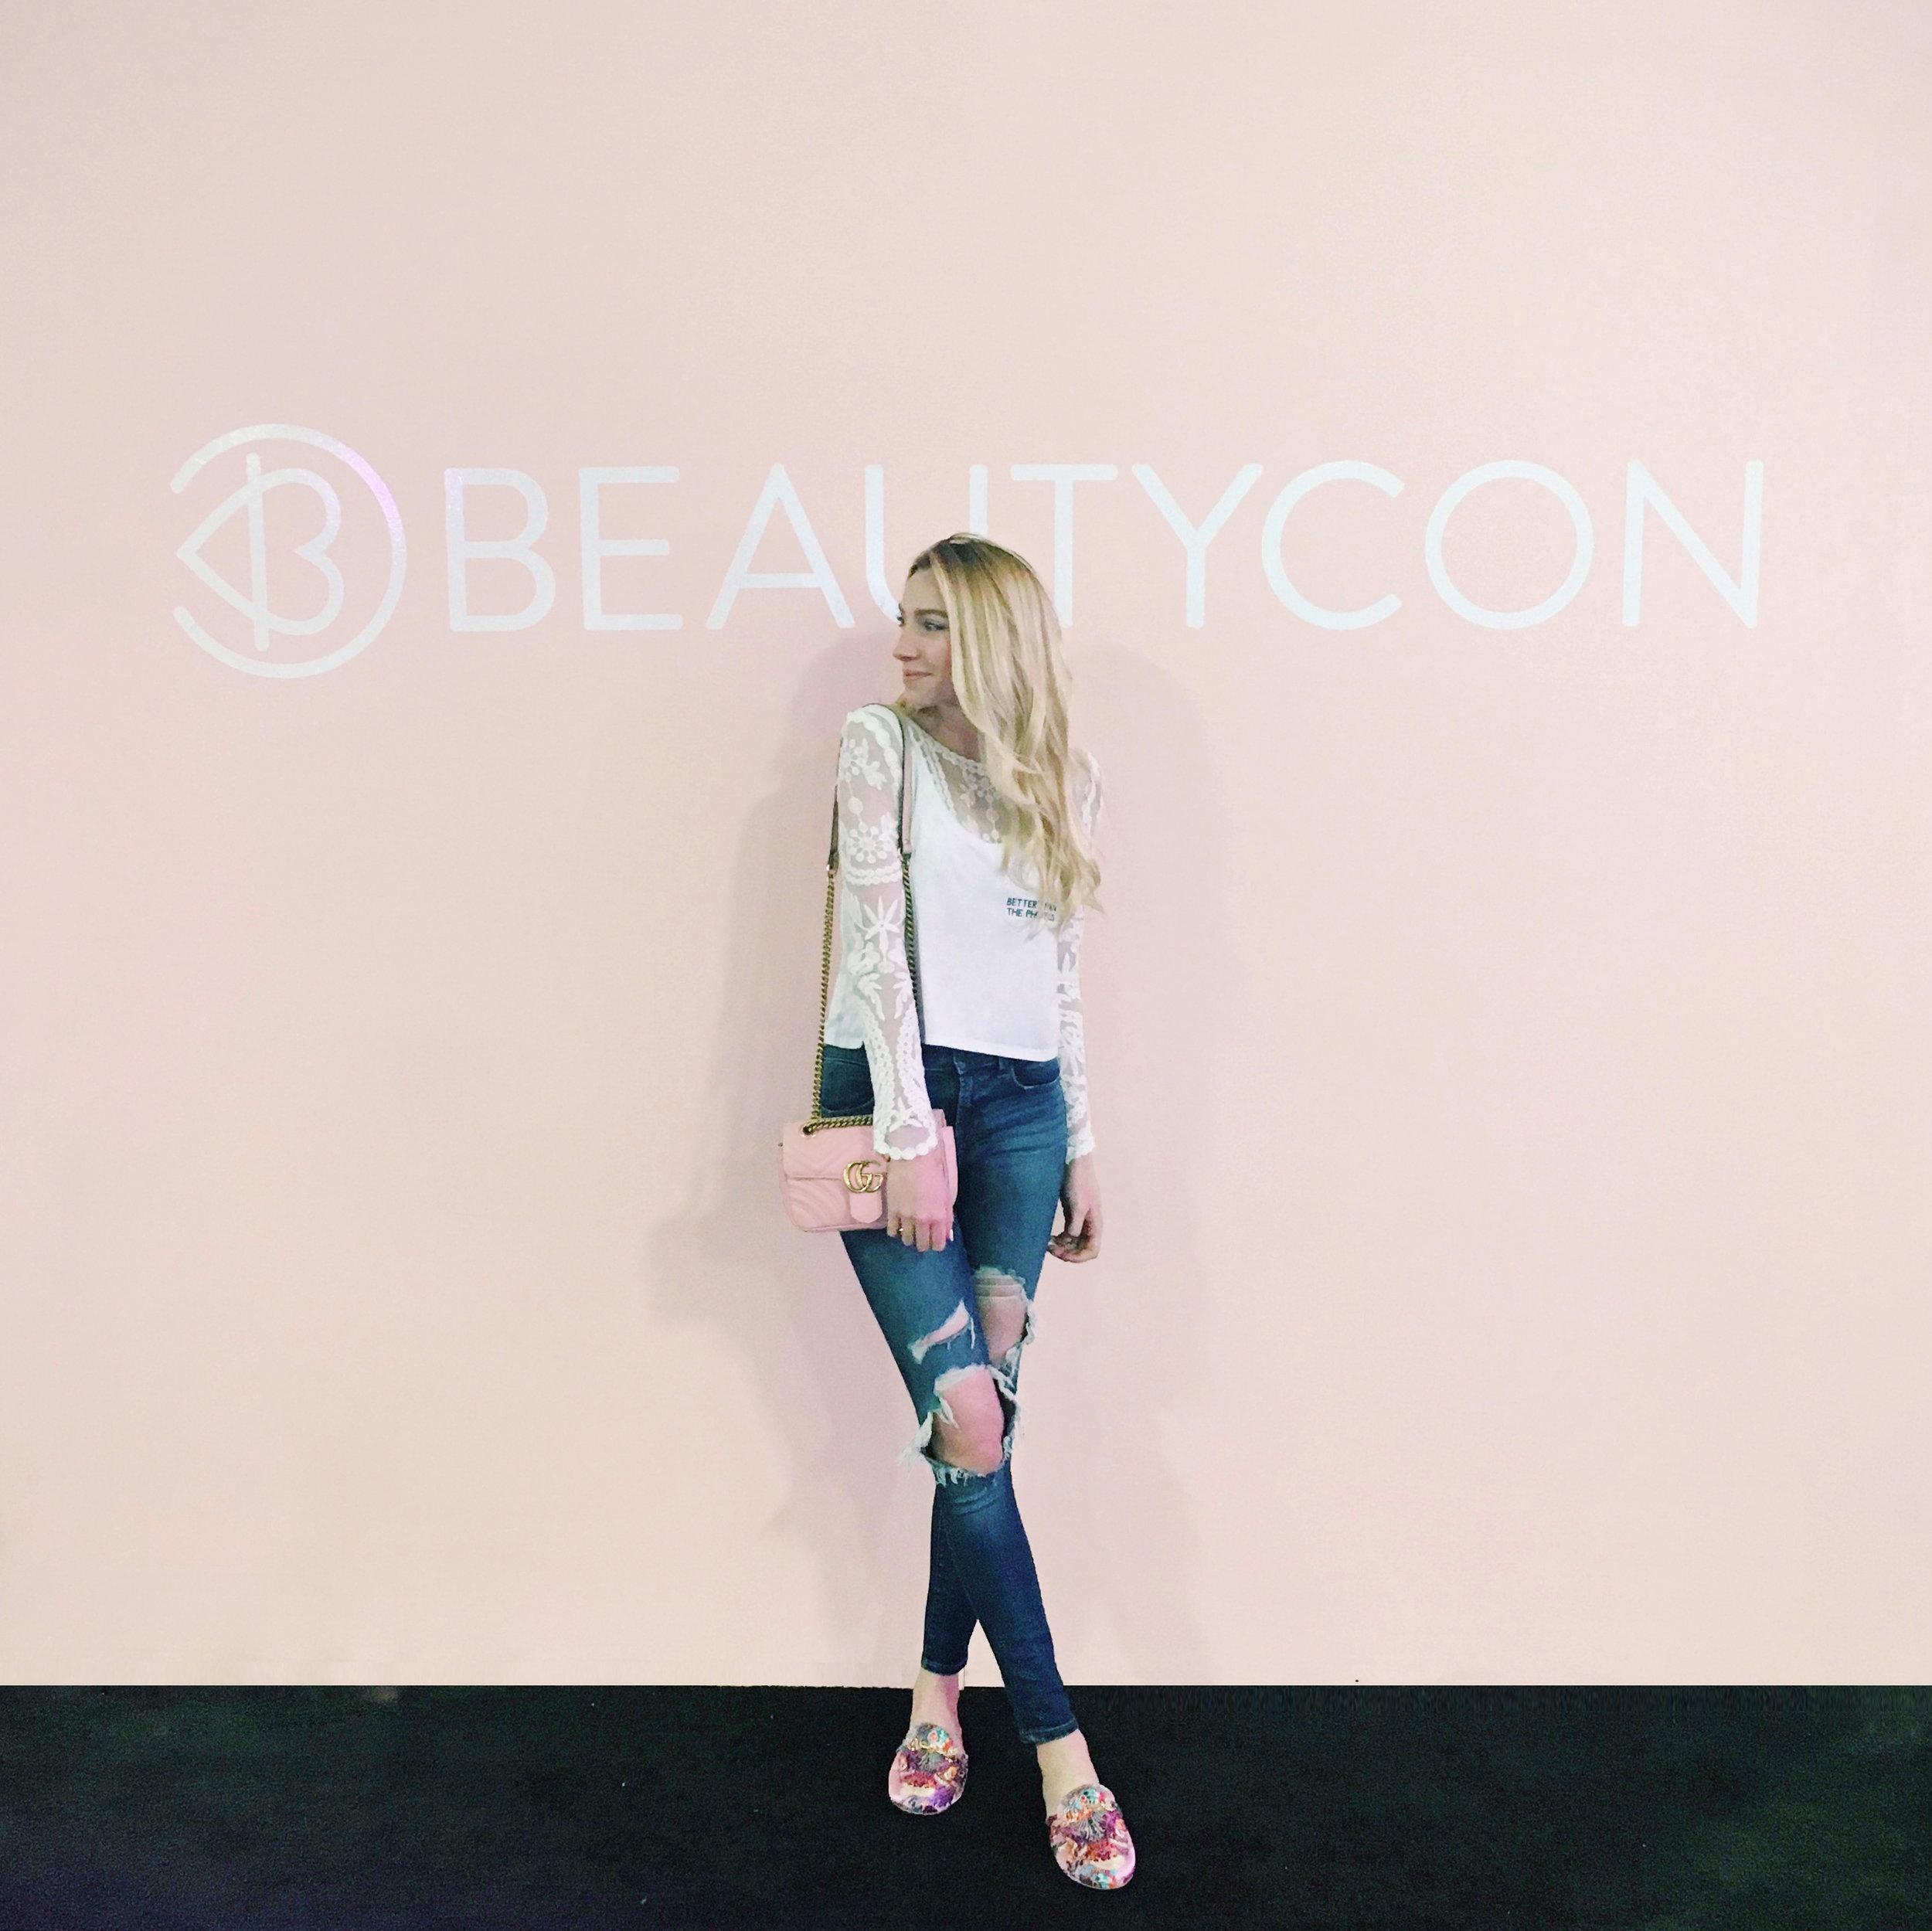 Blogger BeautyCon NYC